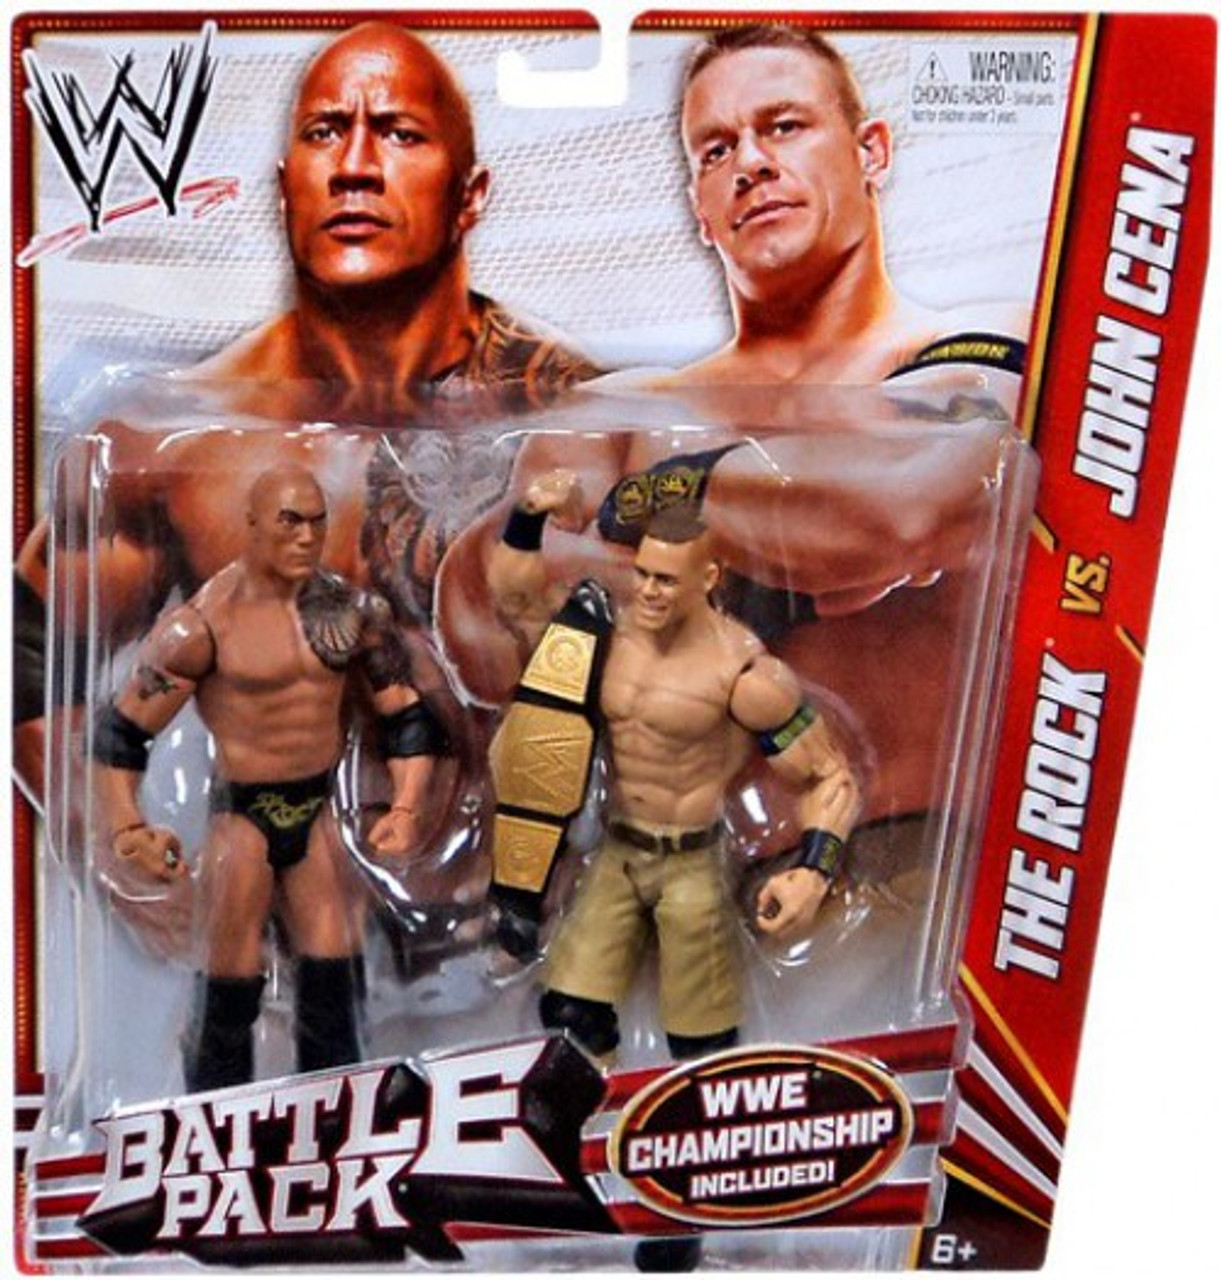 WWE Wrestling Series 24 The Rock vs. John Cena Action Figure 2-Pack [WWE Championship]